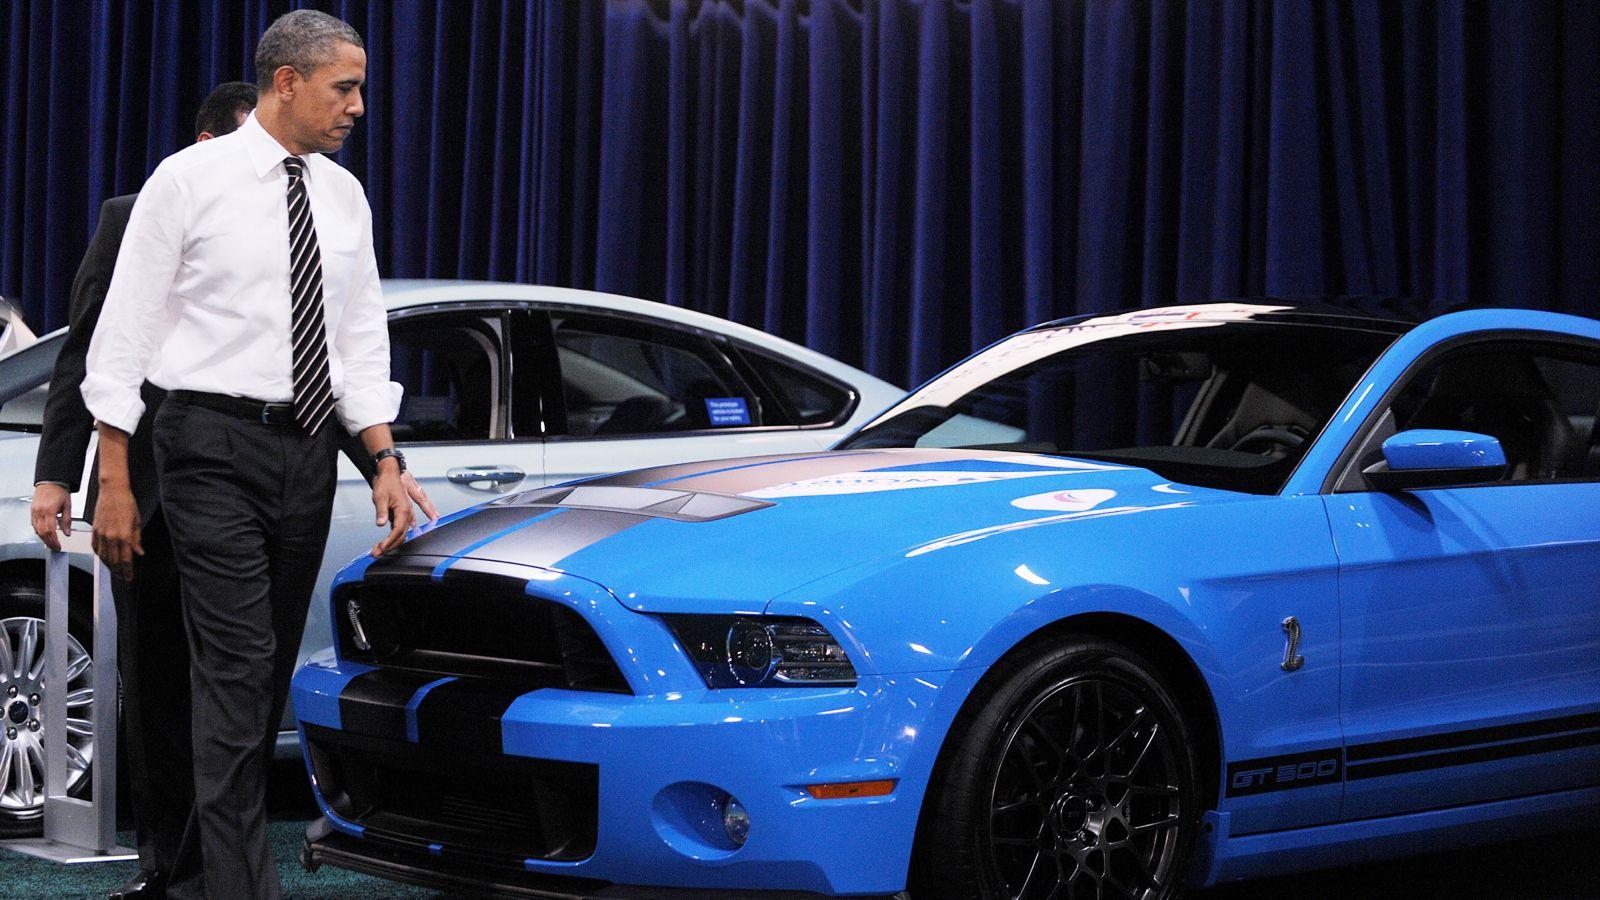 Barack Obama Car Price